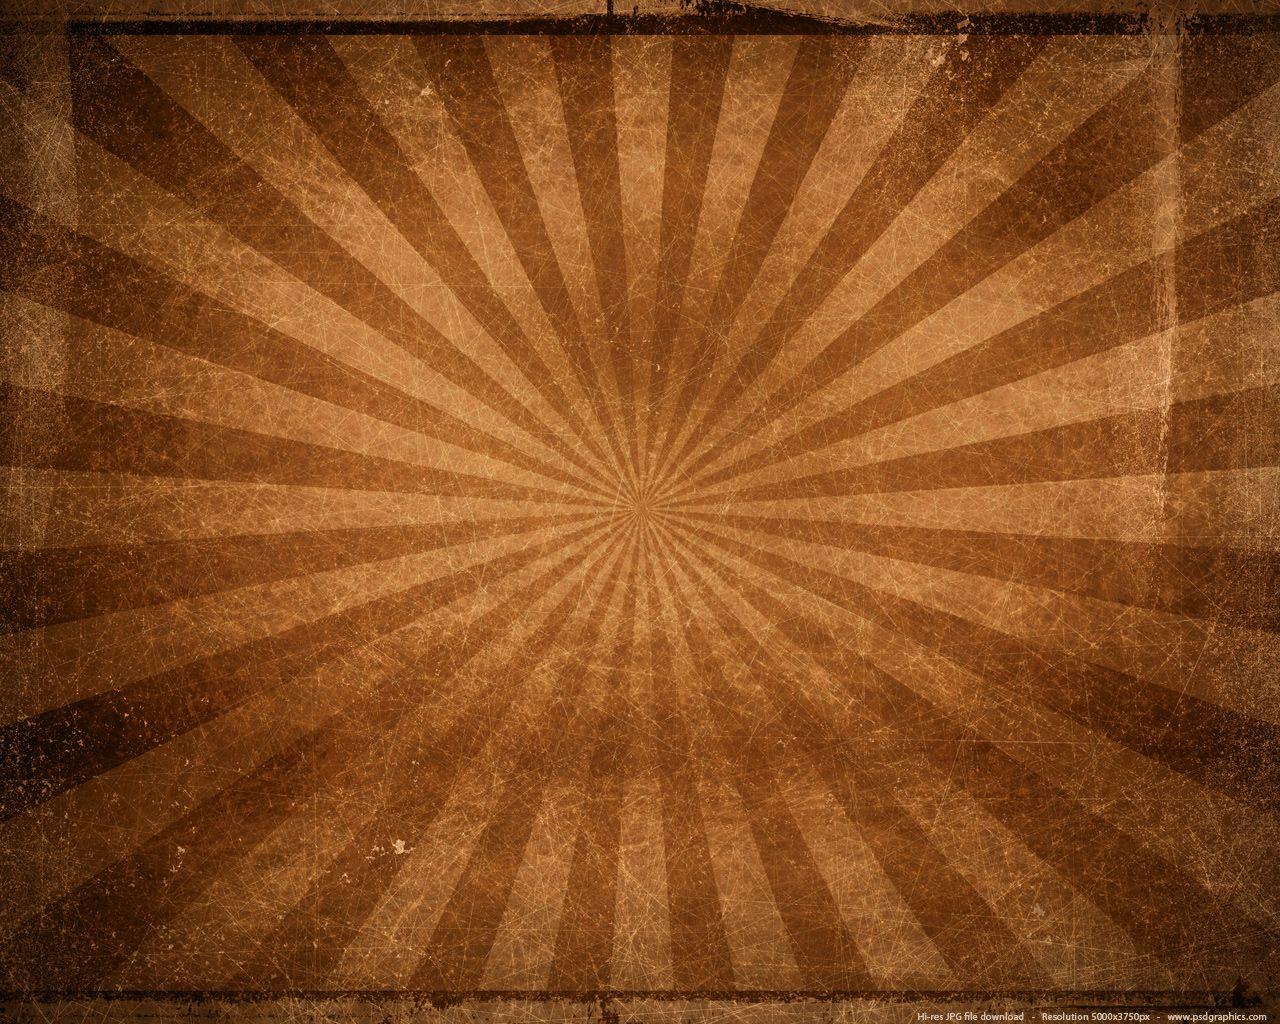 file format jpg color theme light and dark brown keywords image of ... for Dark Brown Background Wallpaper  166kxo